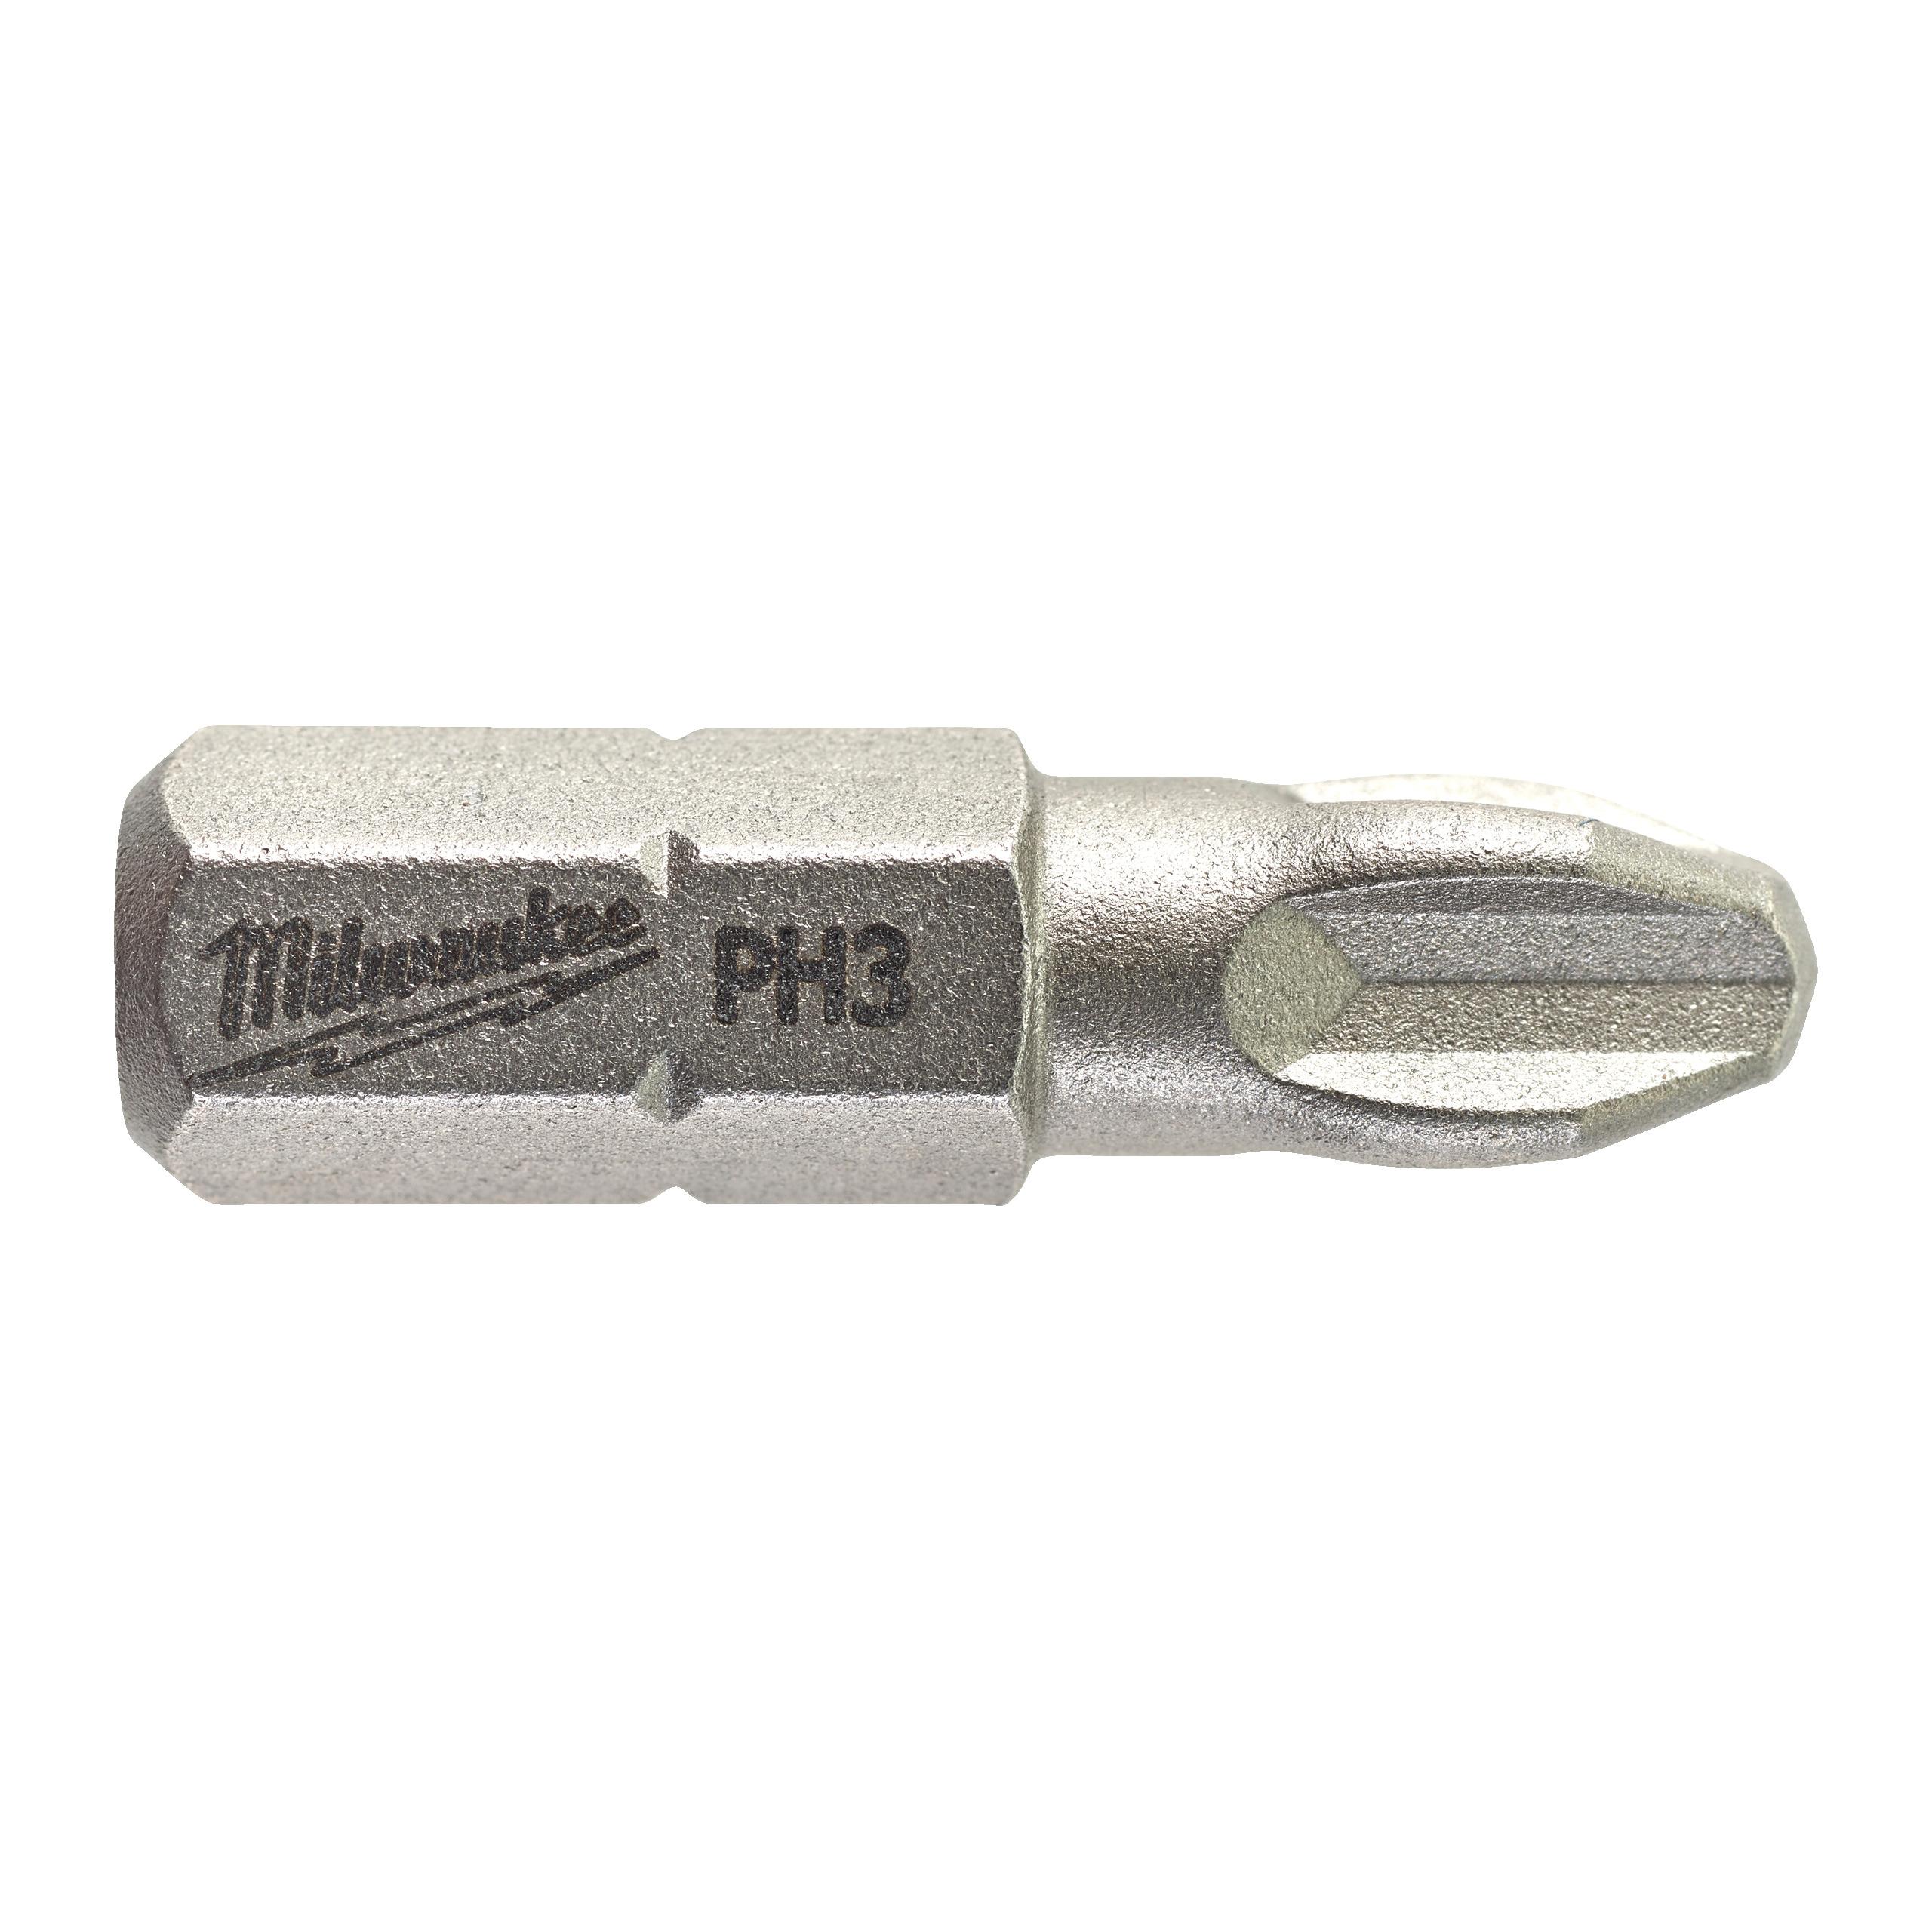 Šroubovací bity PH3,25mm (25ks)